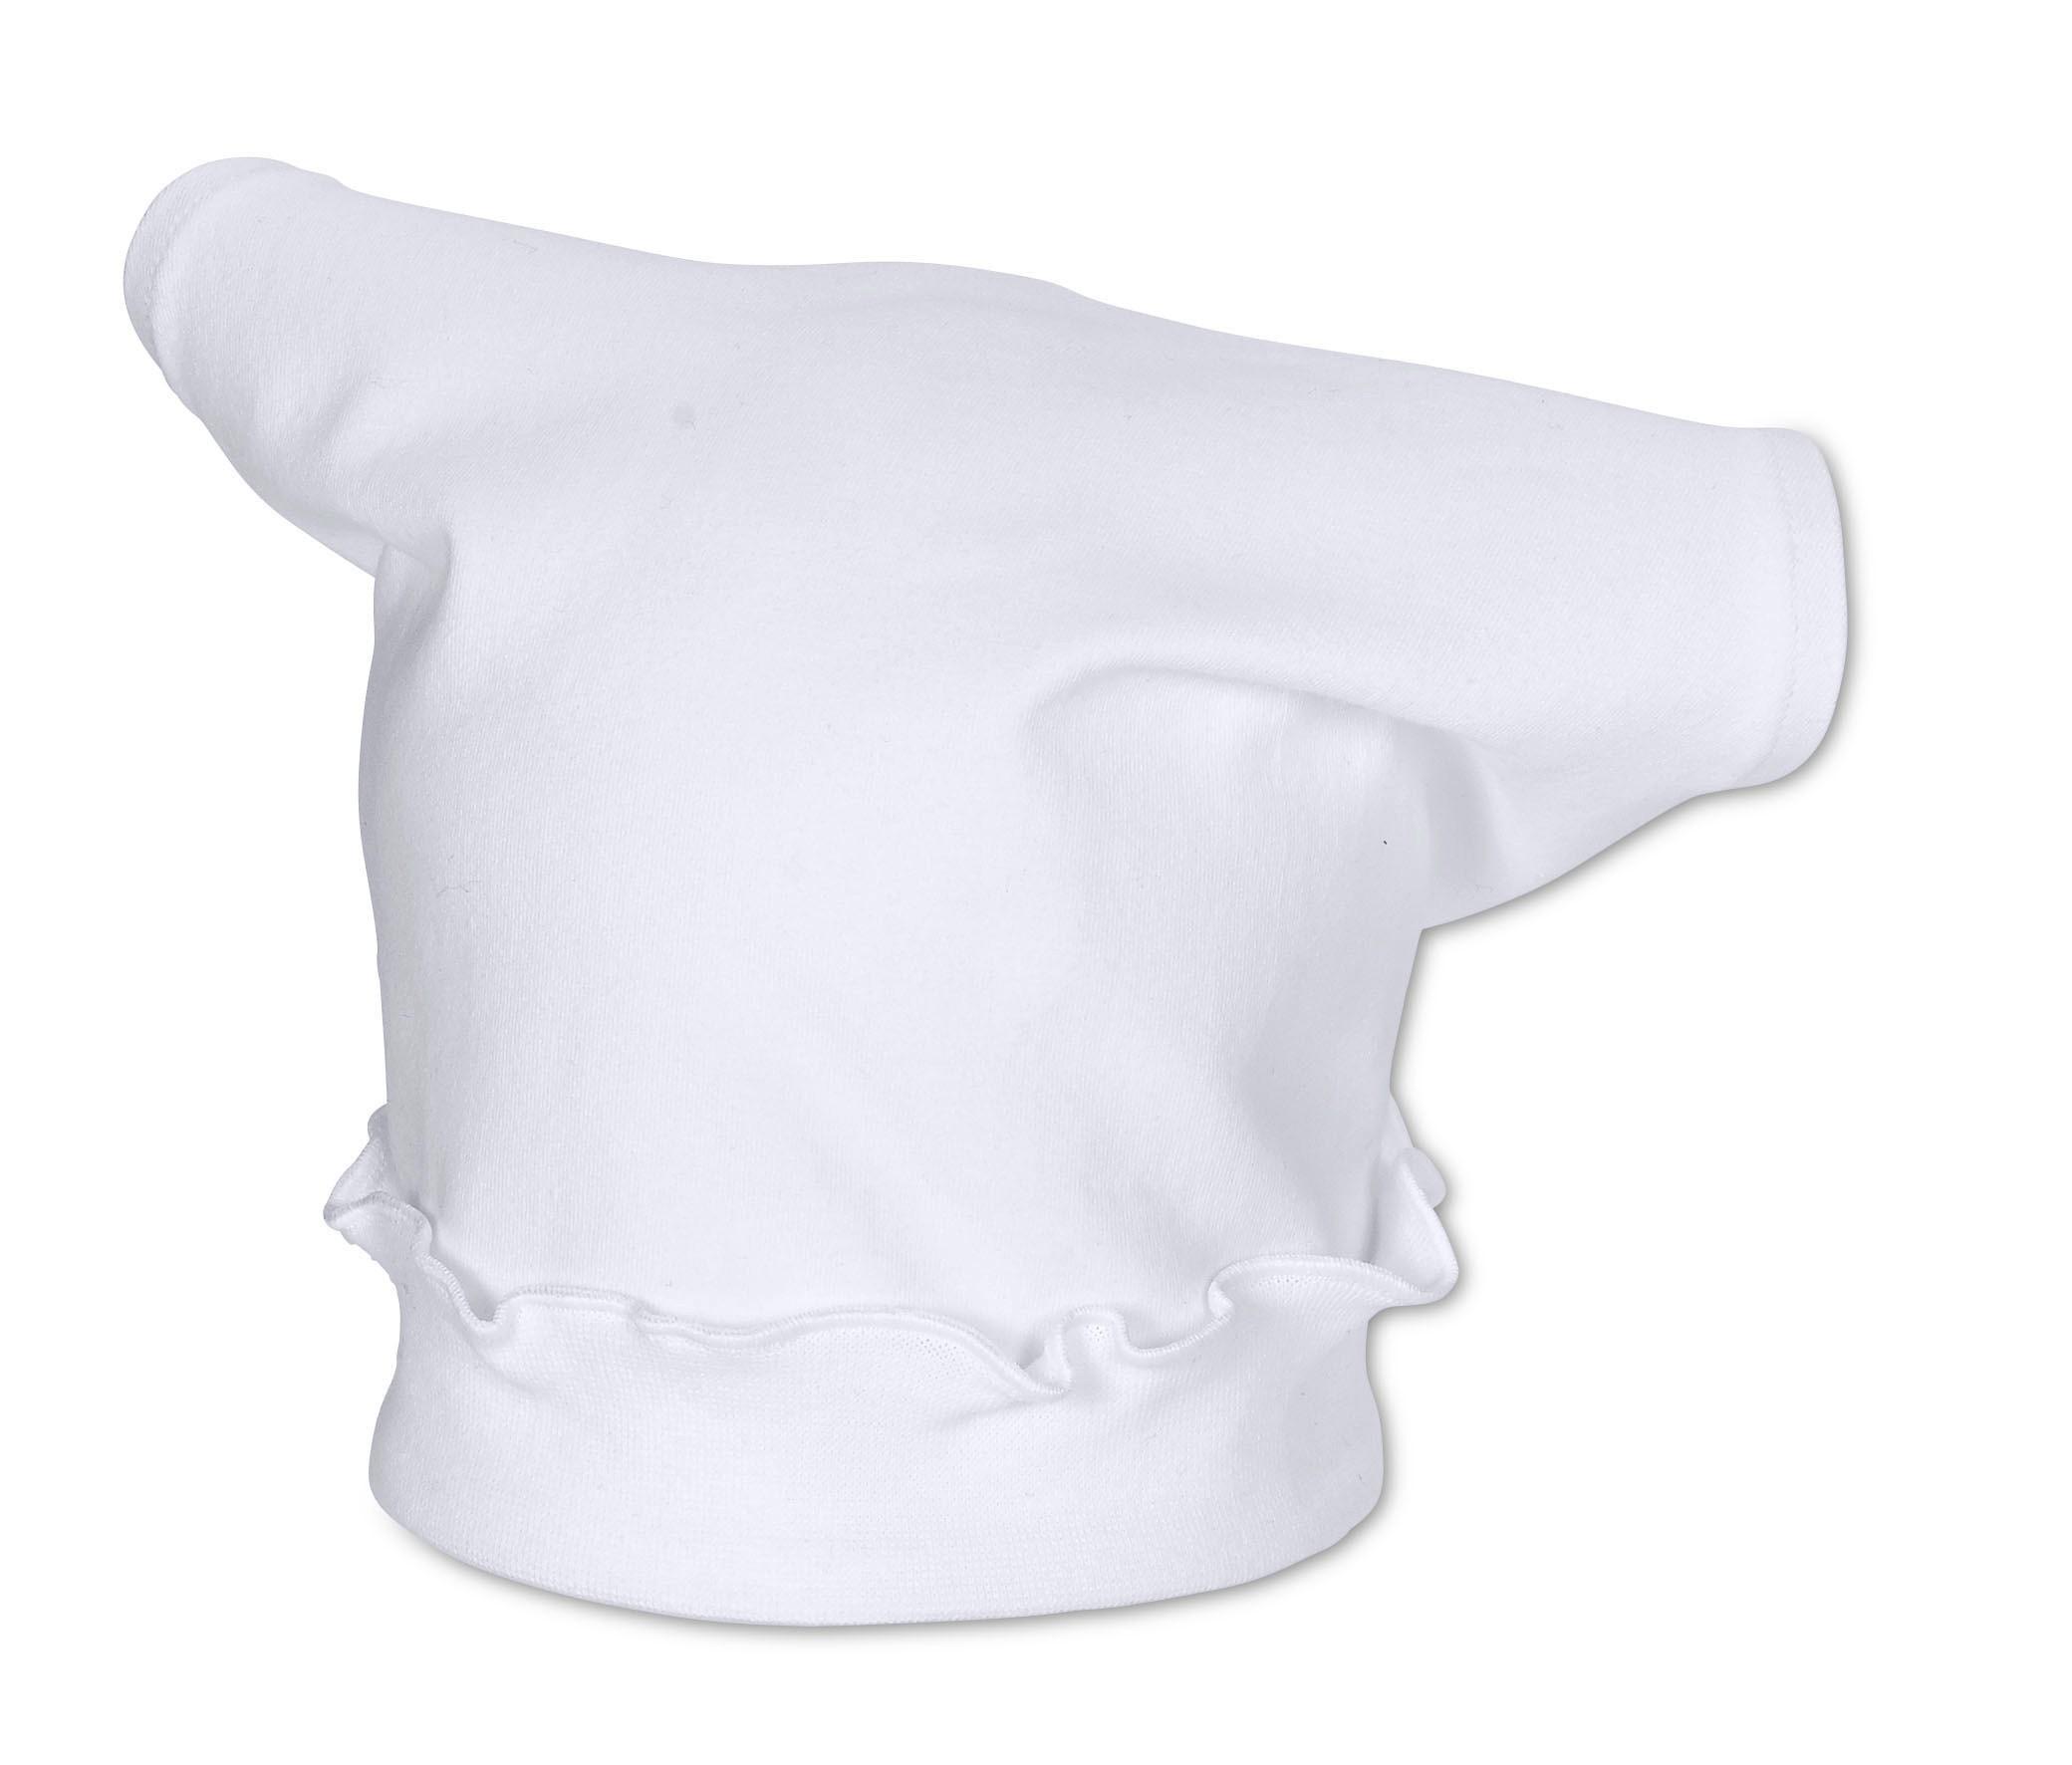 sterntaler m dchen baby kopftuch single jersey unifarben sommerm tze ebay. Black Bedroom Furniture Sets. Home Design Ideas